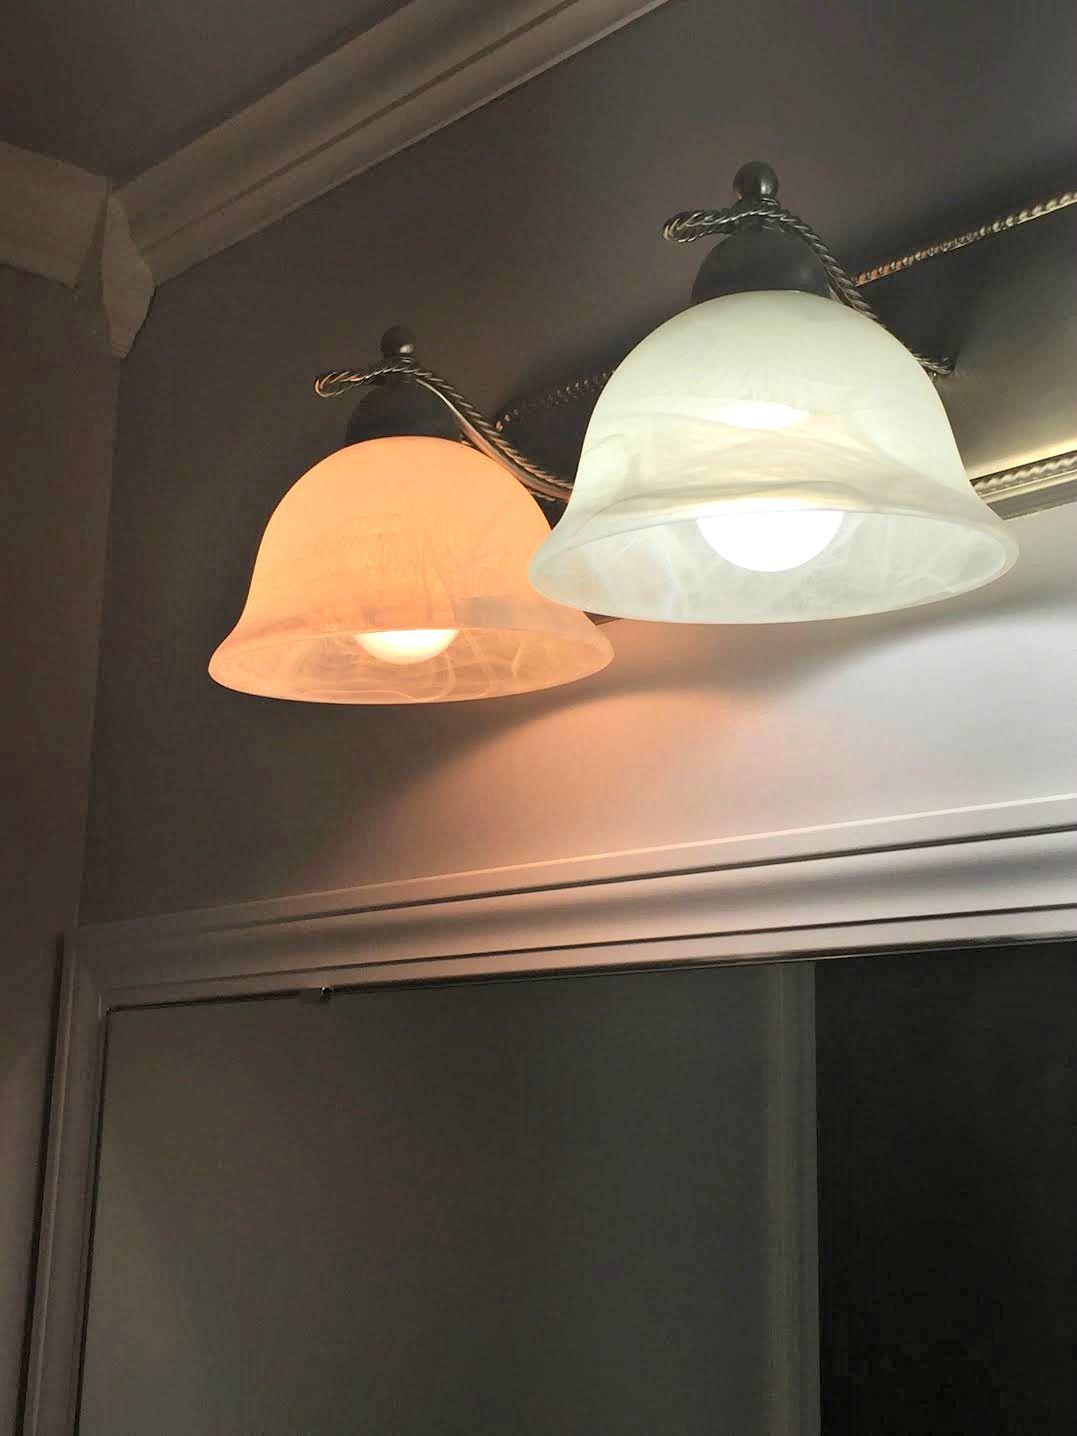 Daylight Led Bulbs: The Daylight Bulb (Amazing!)